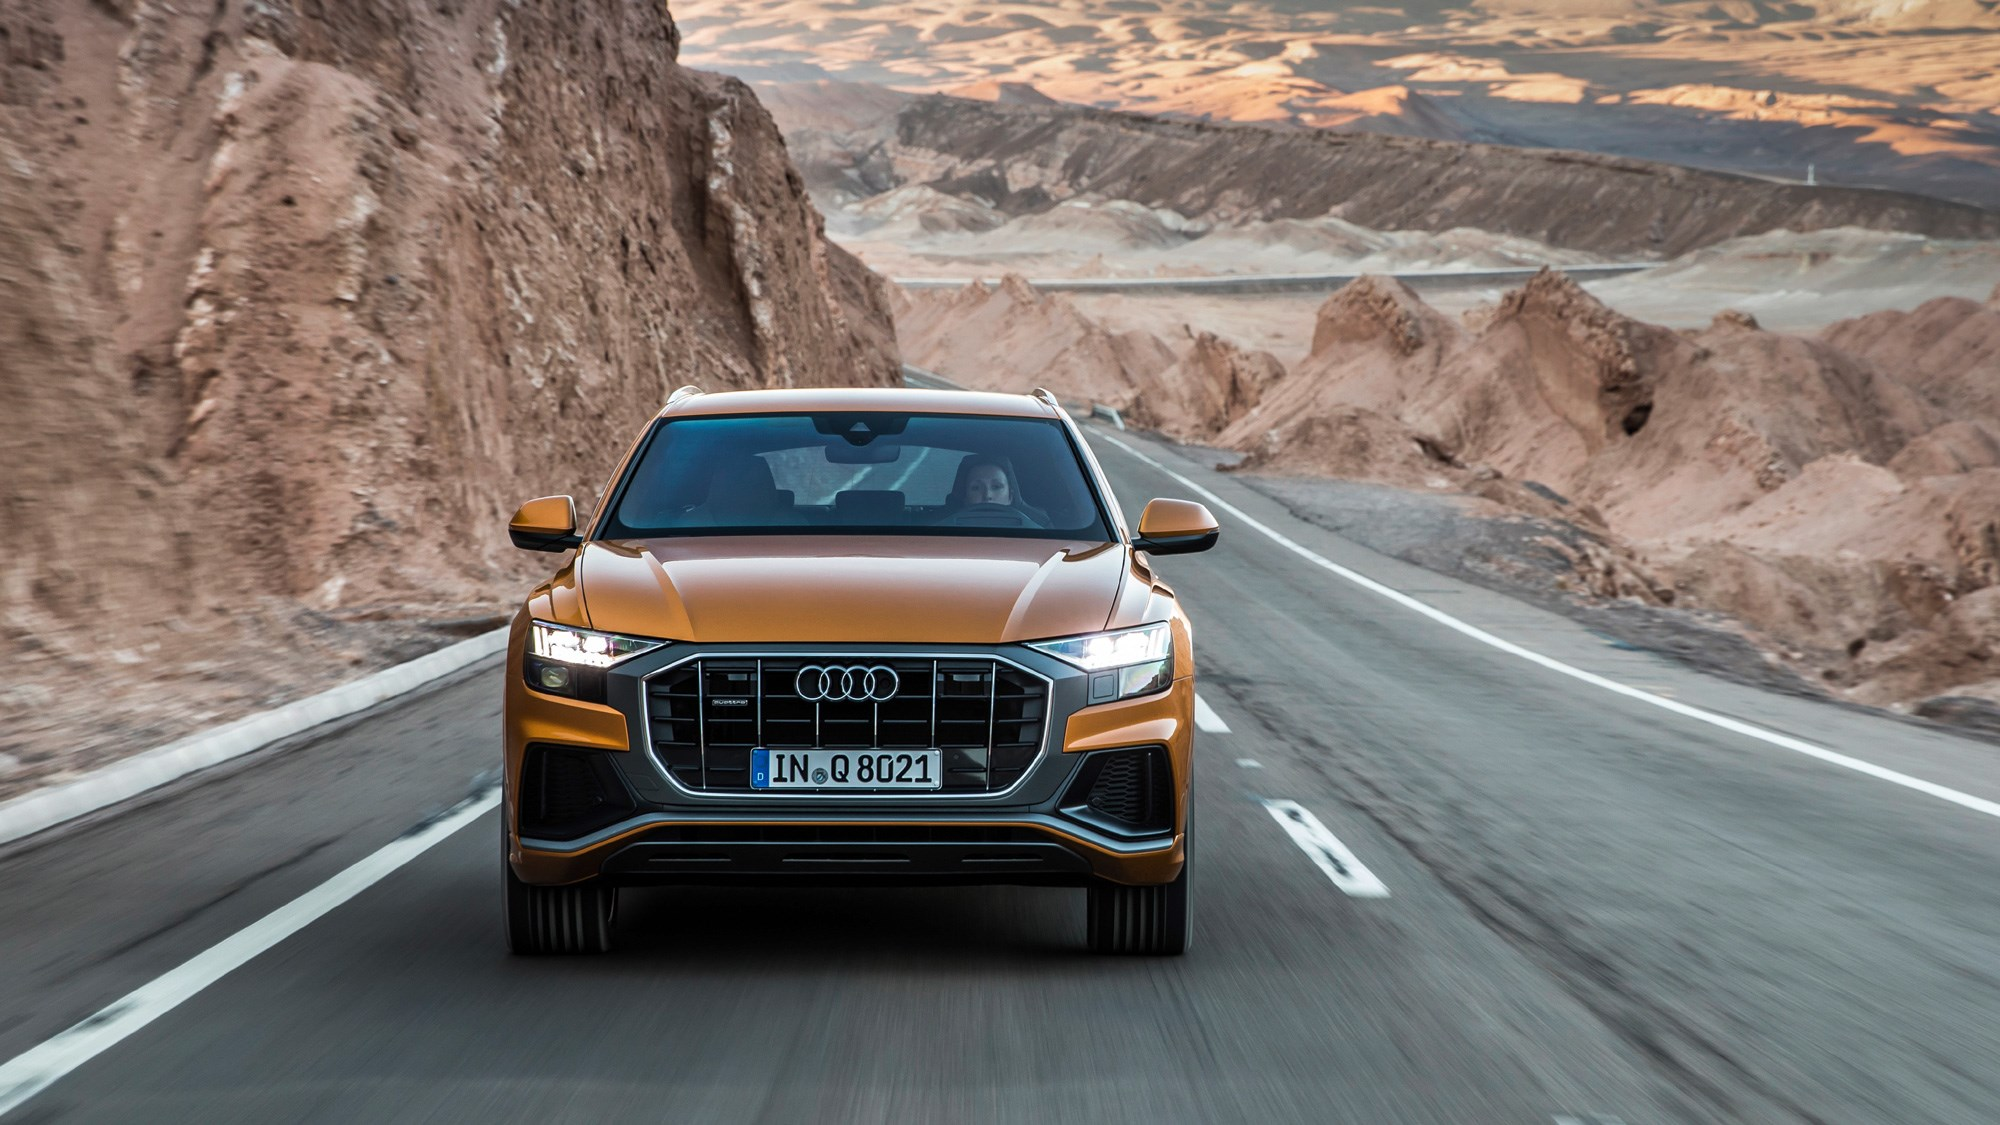 Audi Lease Deals >> Audi Q8 review: a worthy flagship? | CAR Magazine